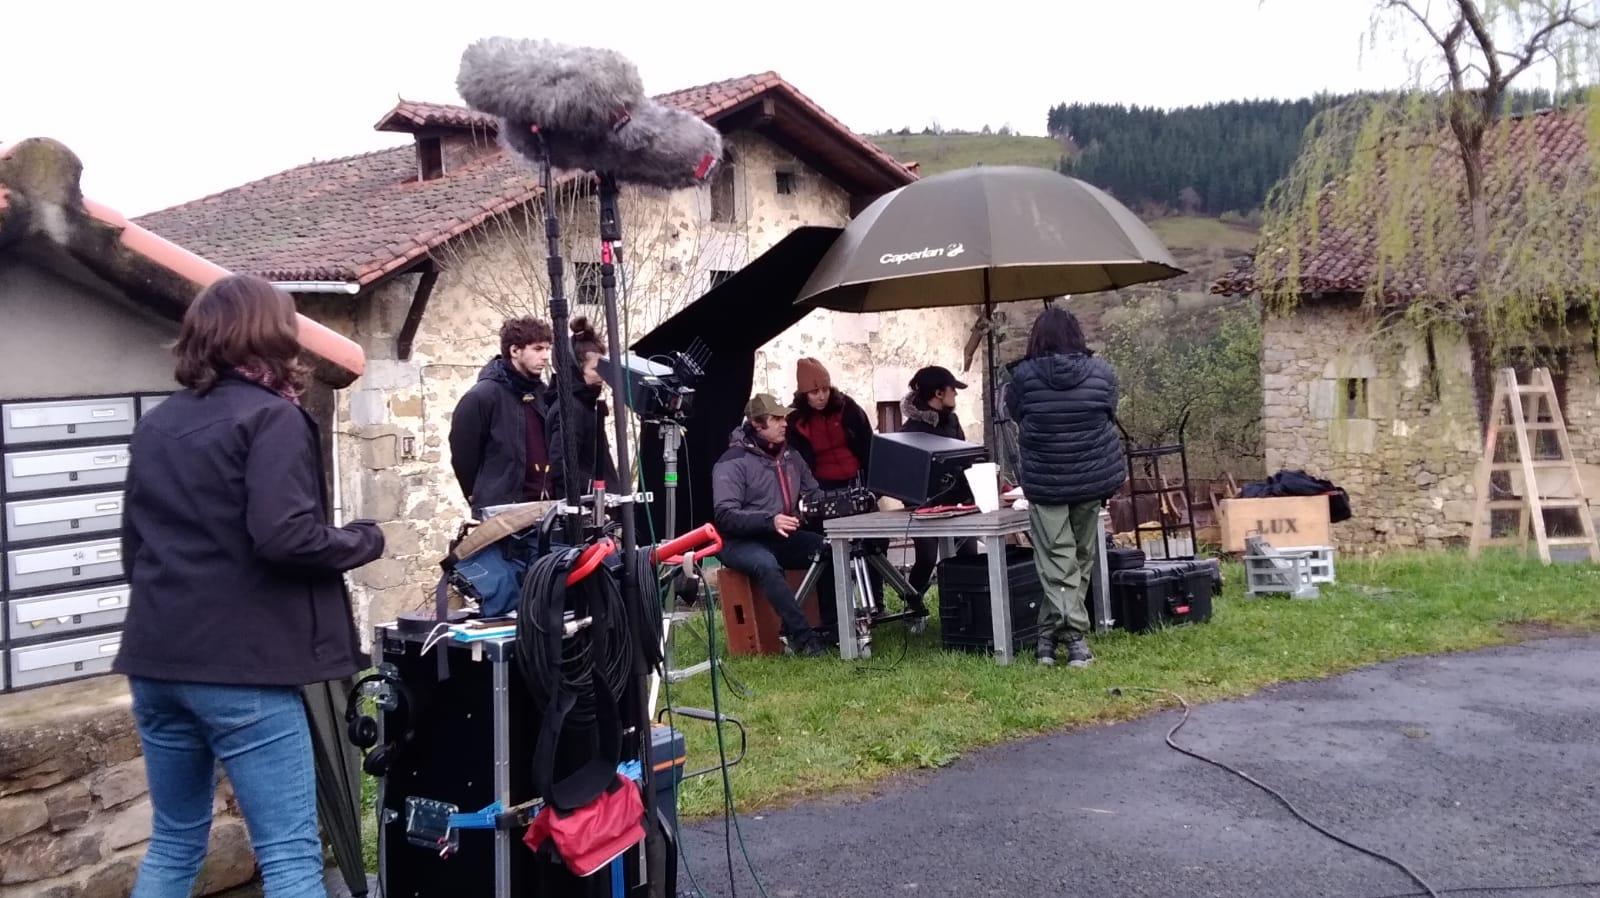 """ILARGI GUZTIAK"": FILMING RETURNS TO EUSKADI"